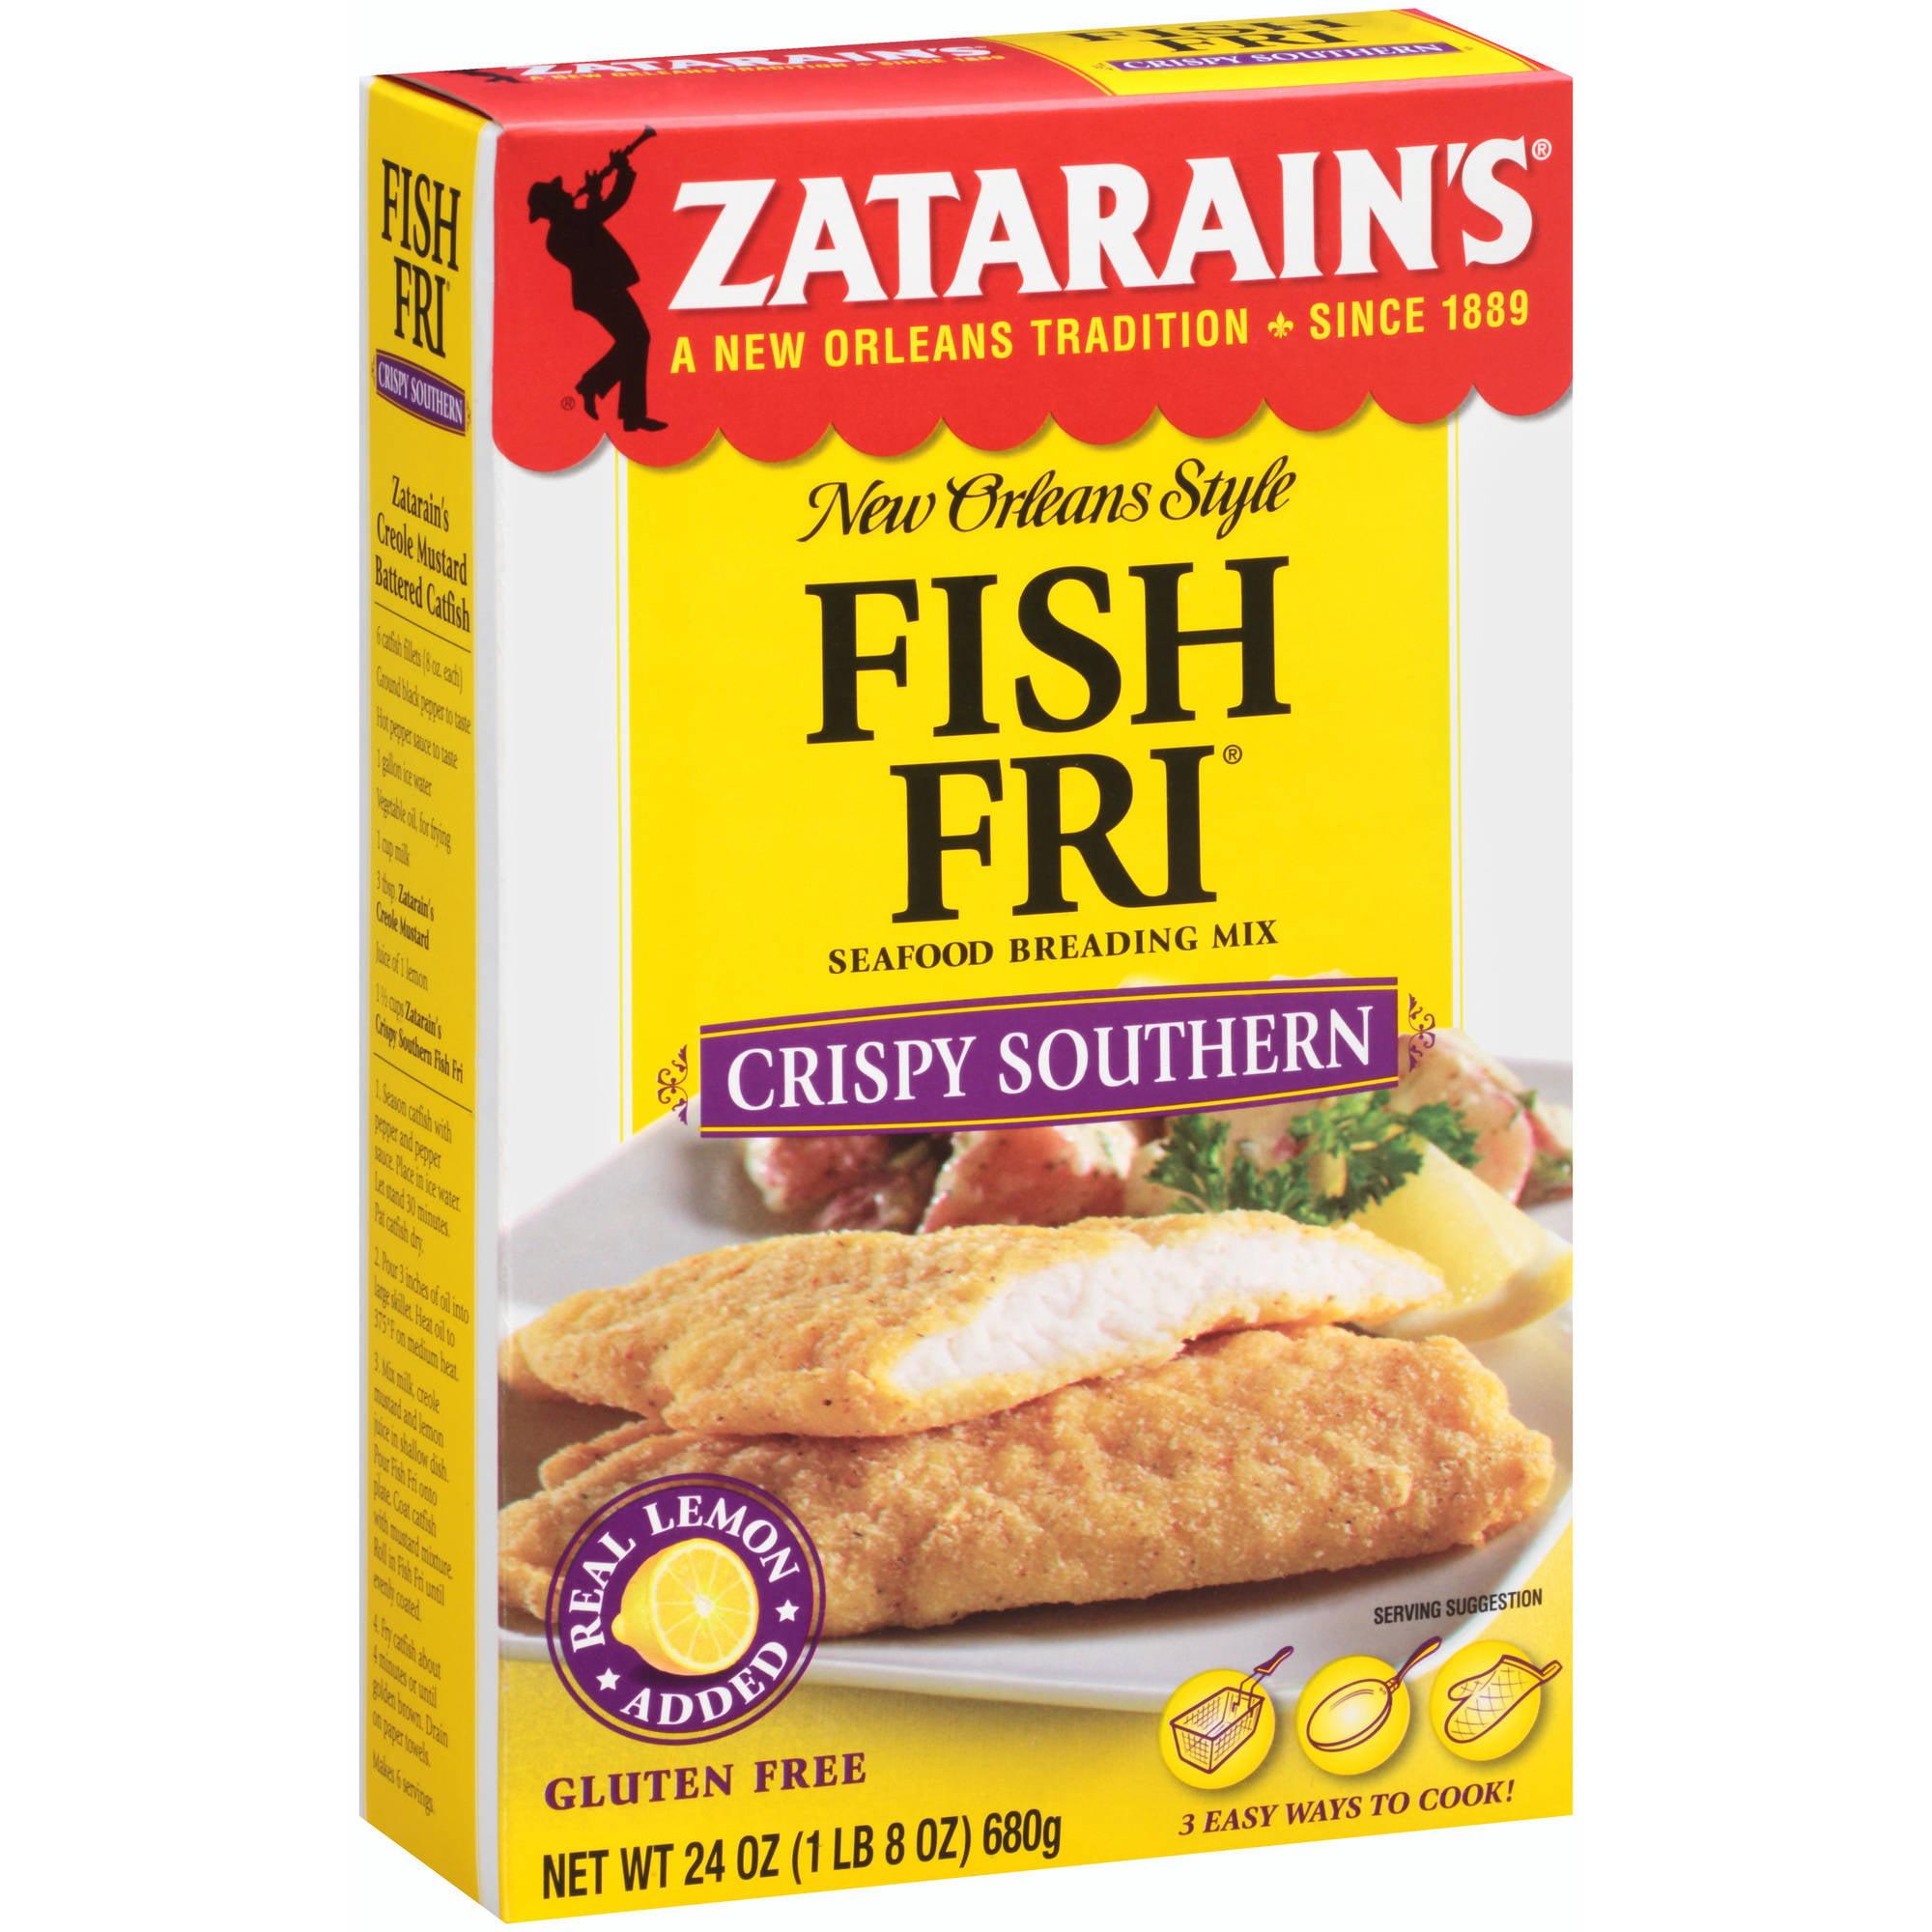 Zatarain's New Orleans Style Fish Fri Crispy Southern Seafood Breading Mix, 24 oz